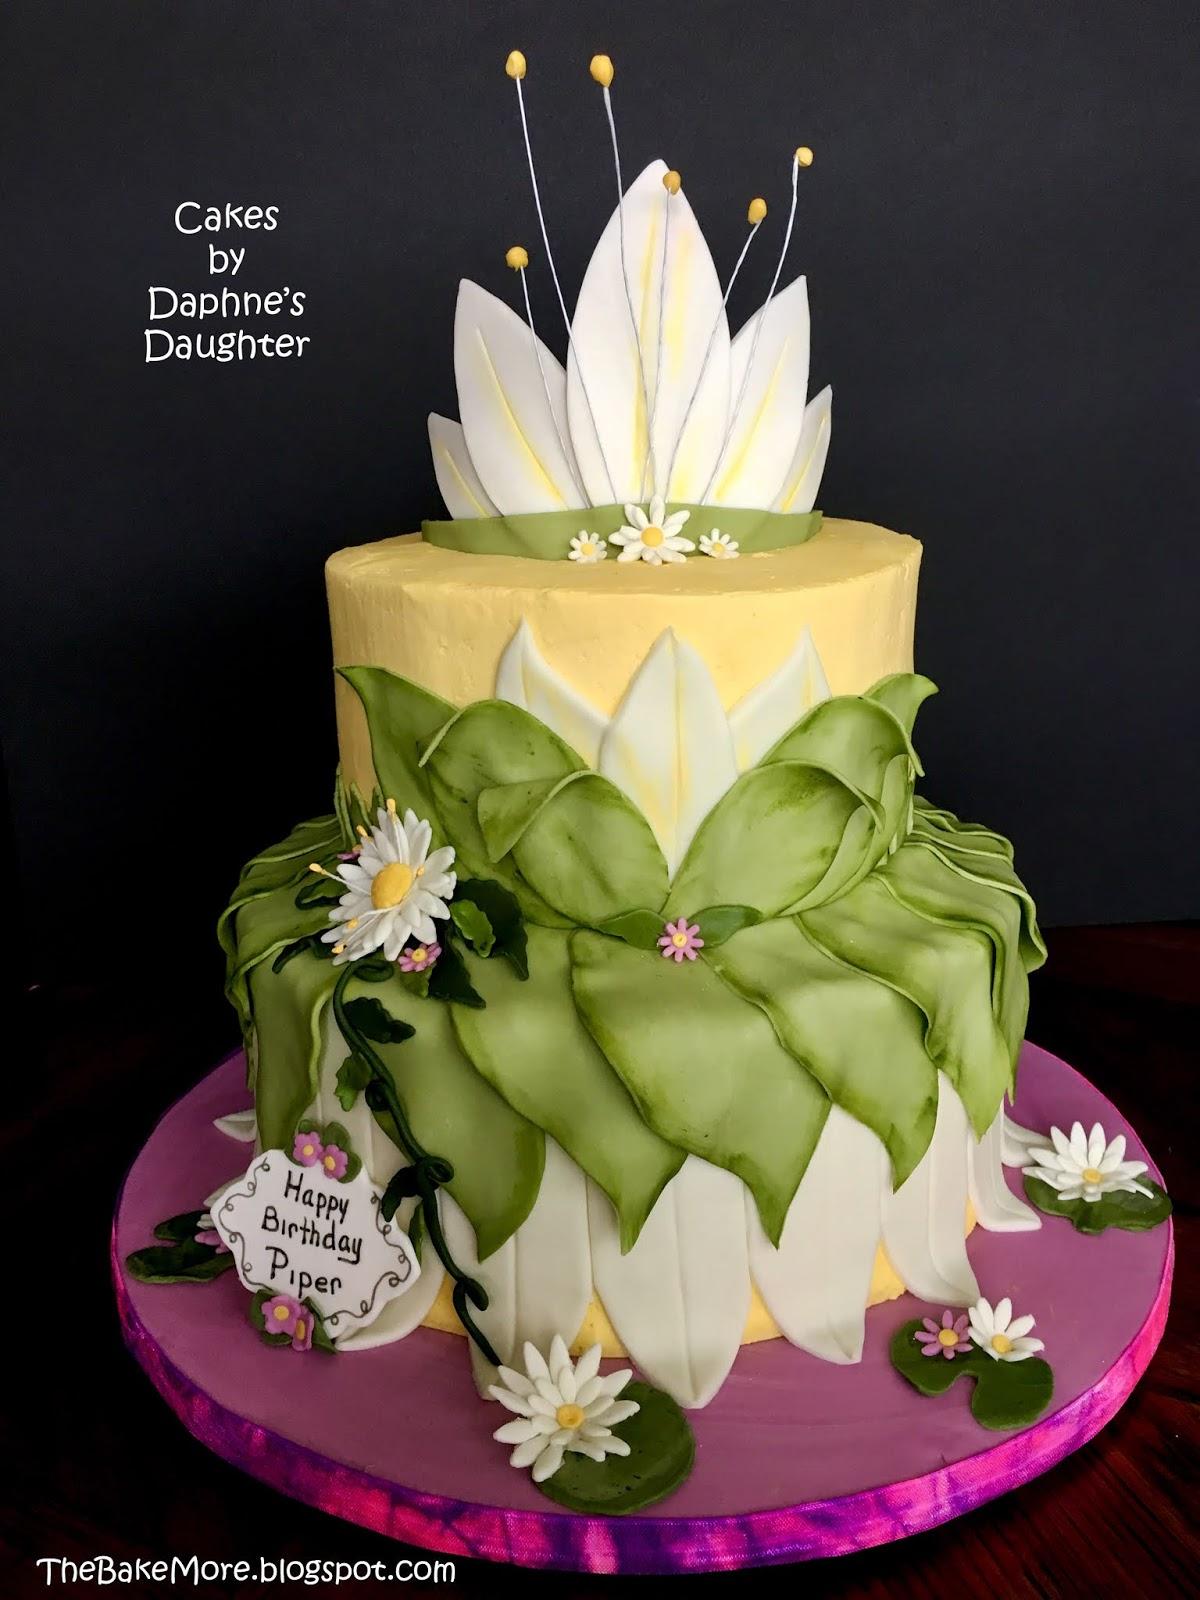 Fantastic The Bake More Princess Tianas Dress In Cake Form Funny Birthday Cards Online Elaedamsfinfo